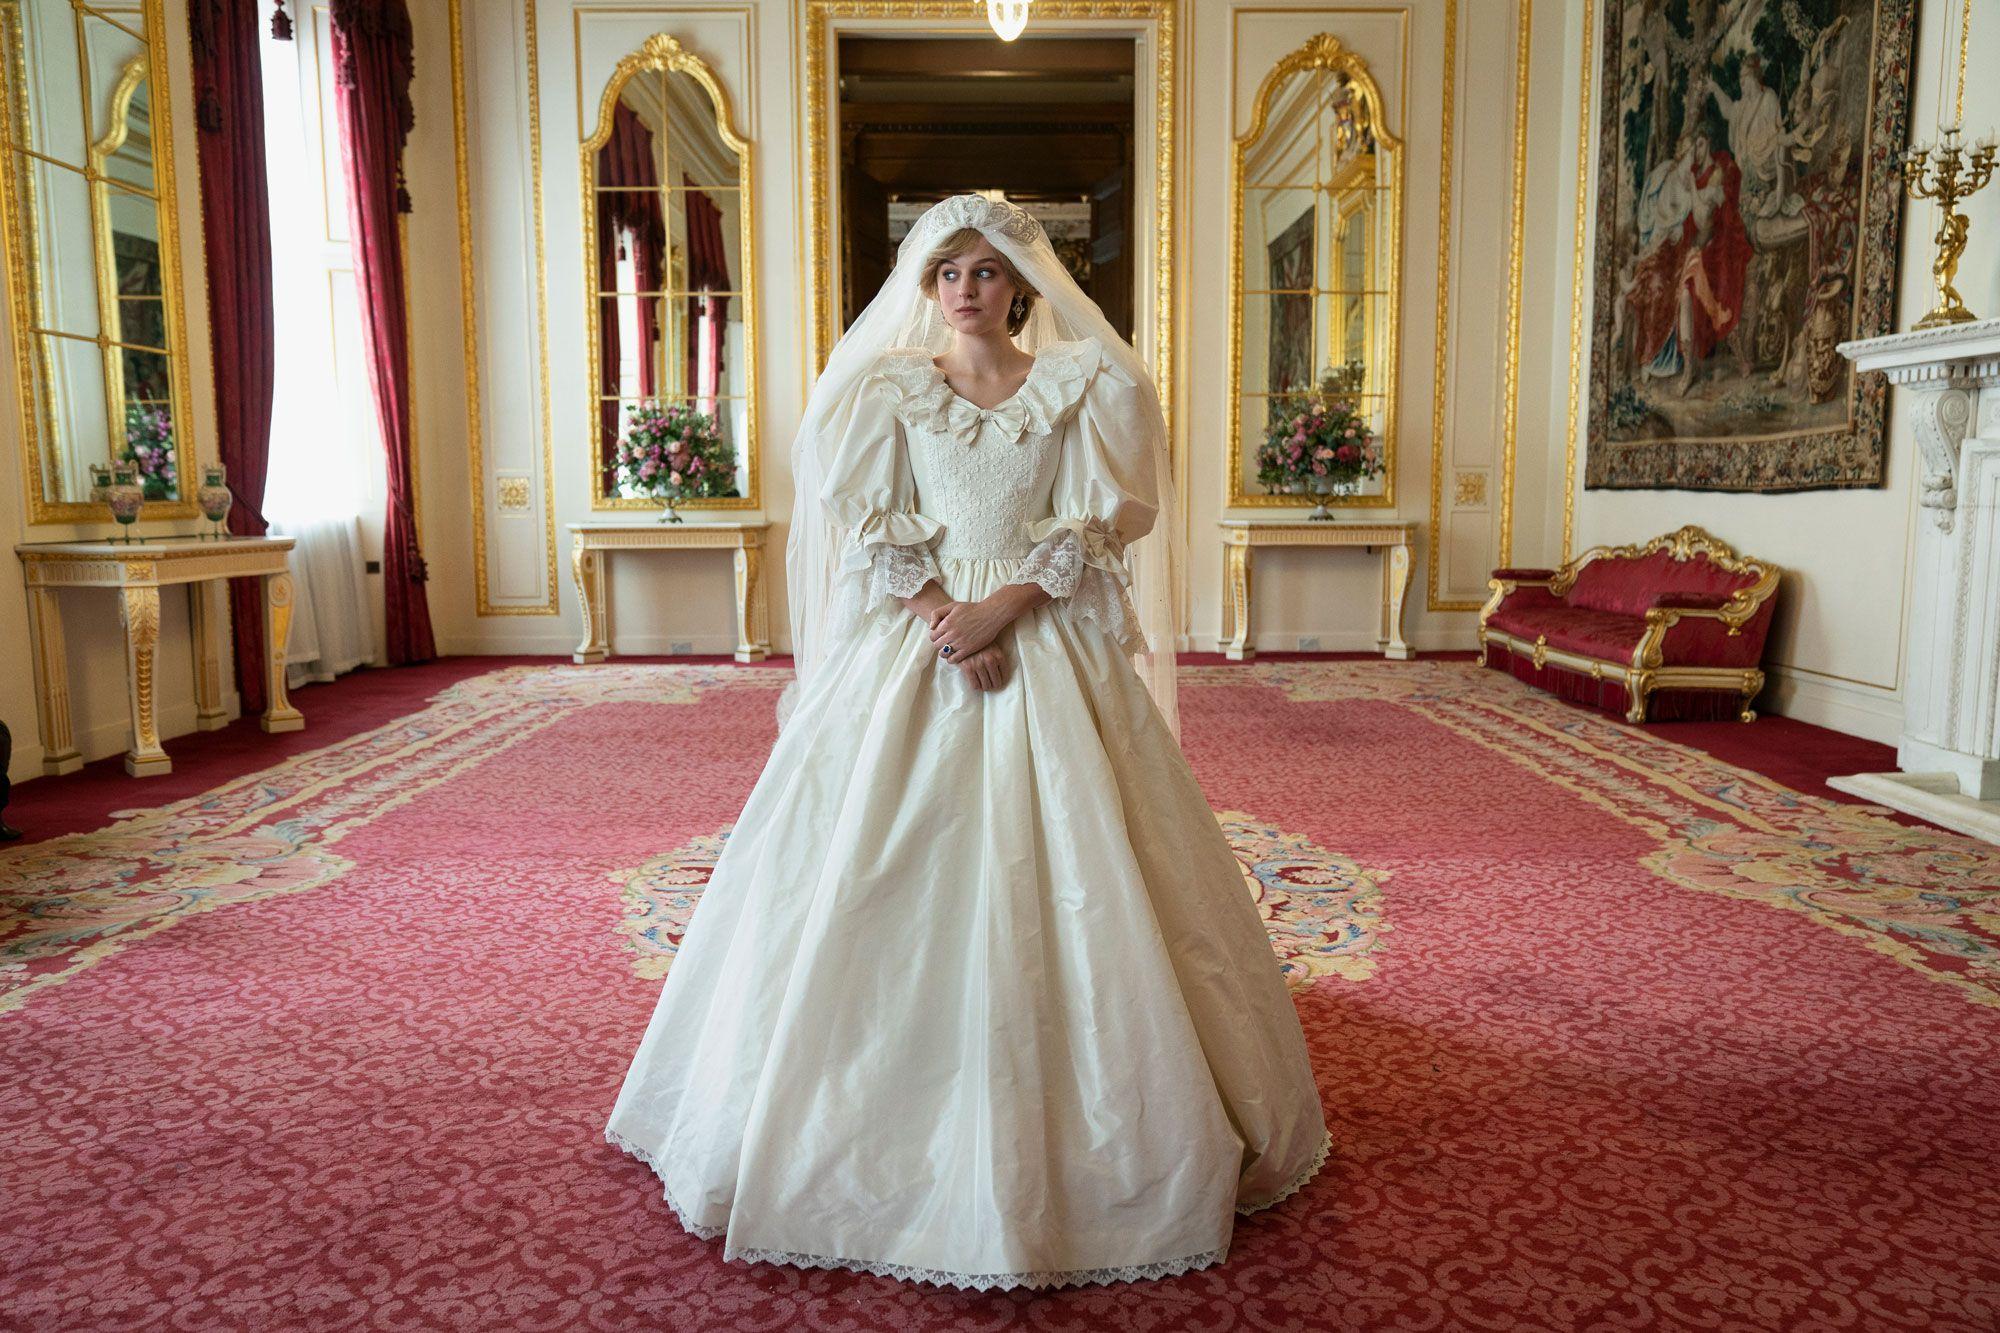 The Crown Season 4 Air Date, Cast, News, Spoilers - Emma Corrin Confirmed  As Princess Diana in Season 4